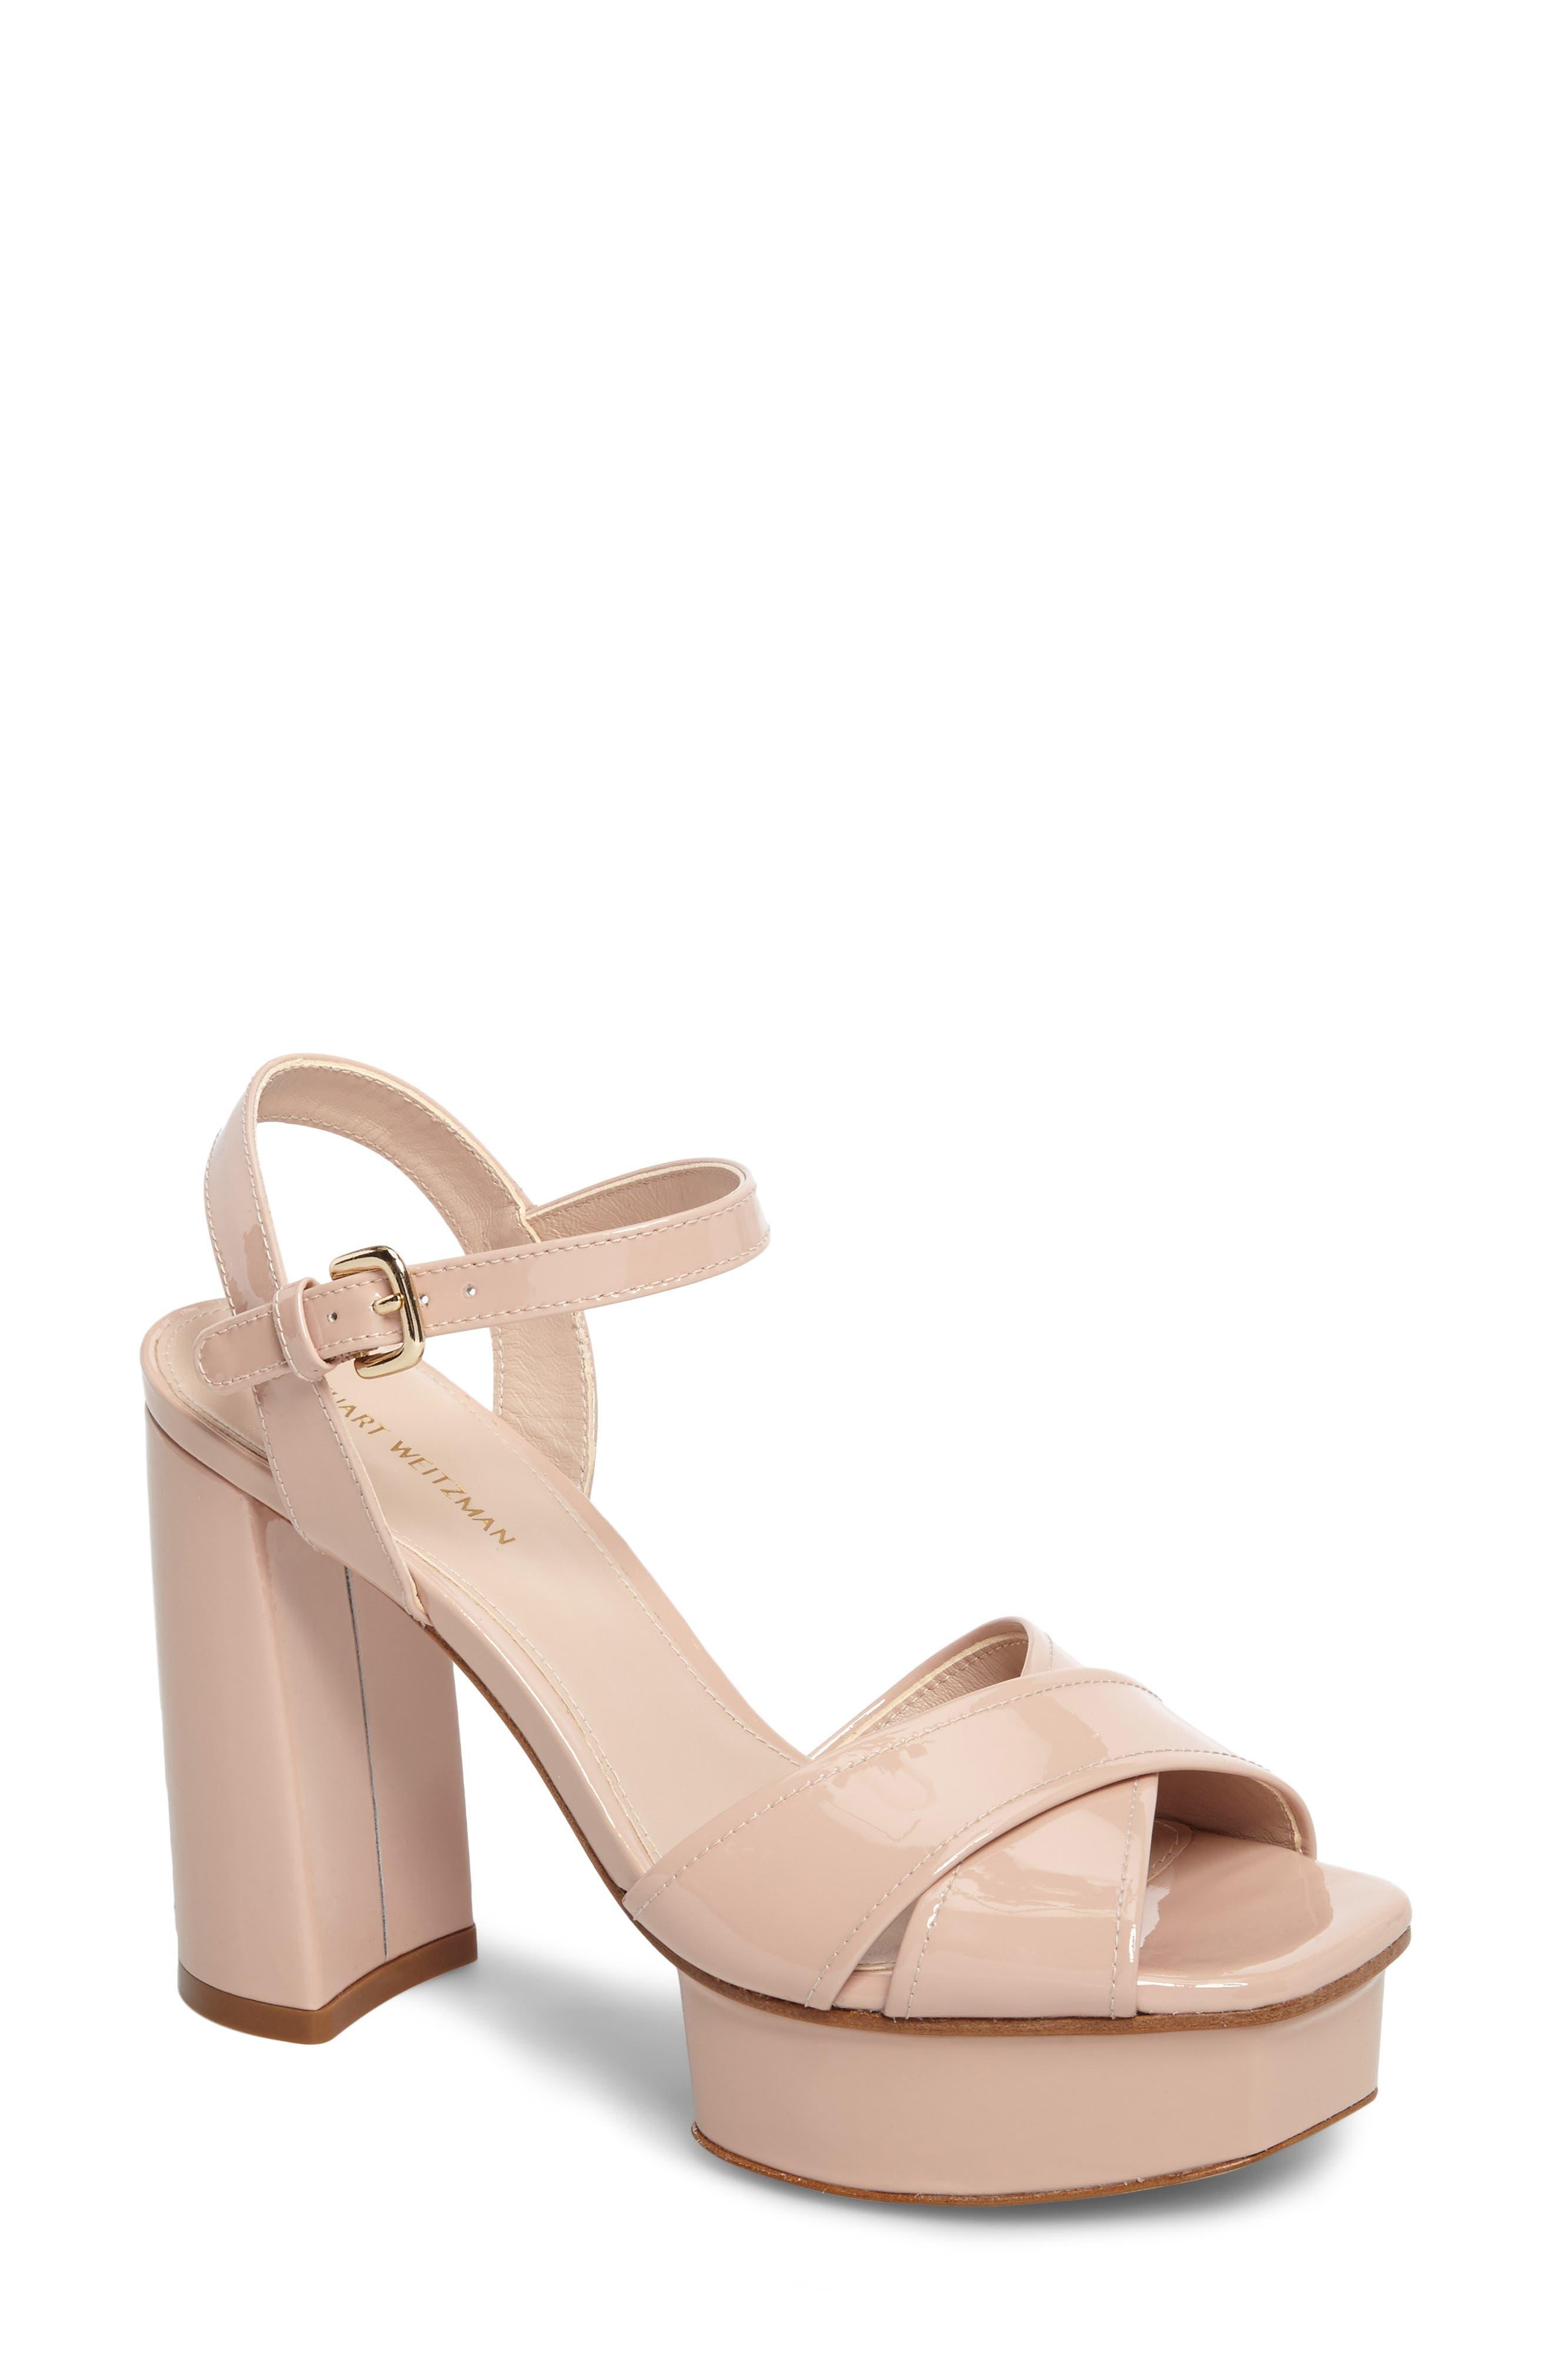 Exposed Platform Sandal,                         Main,                         color, Face Aniline